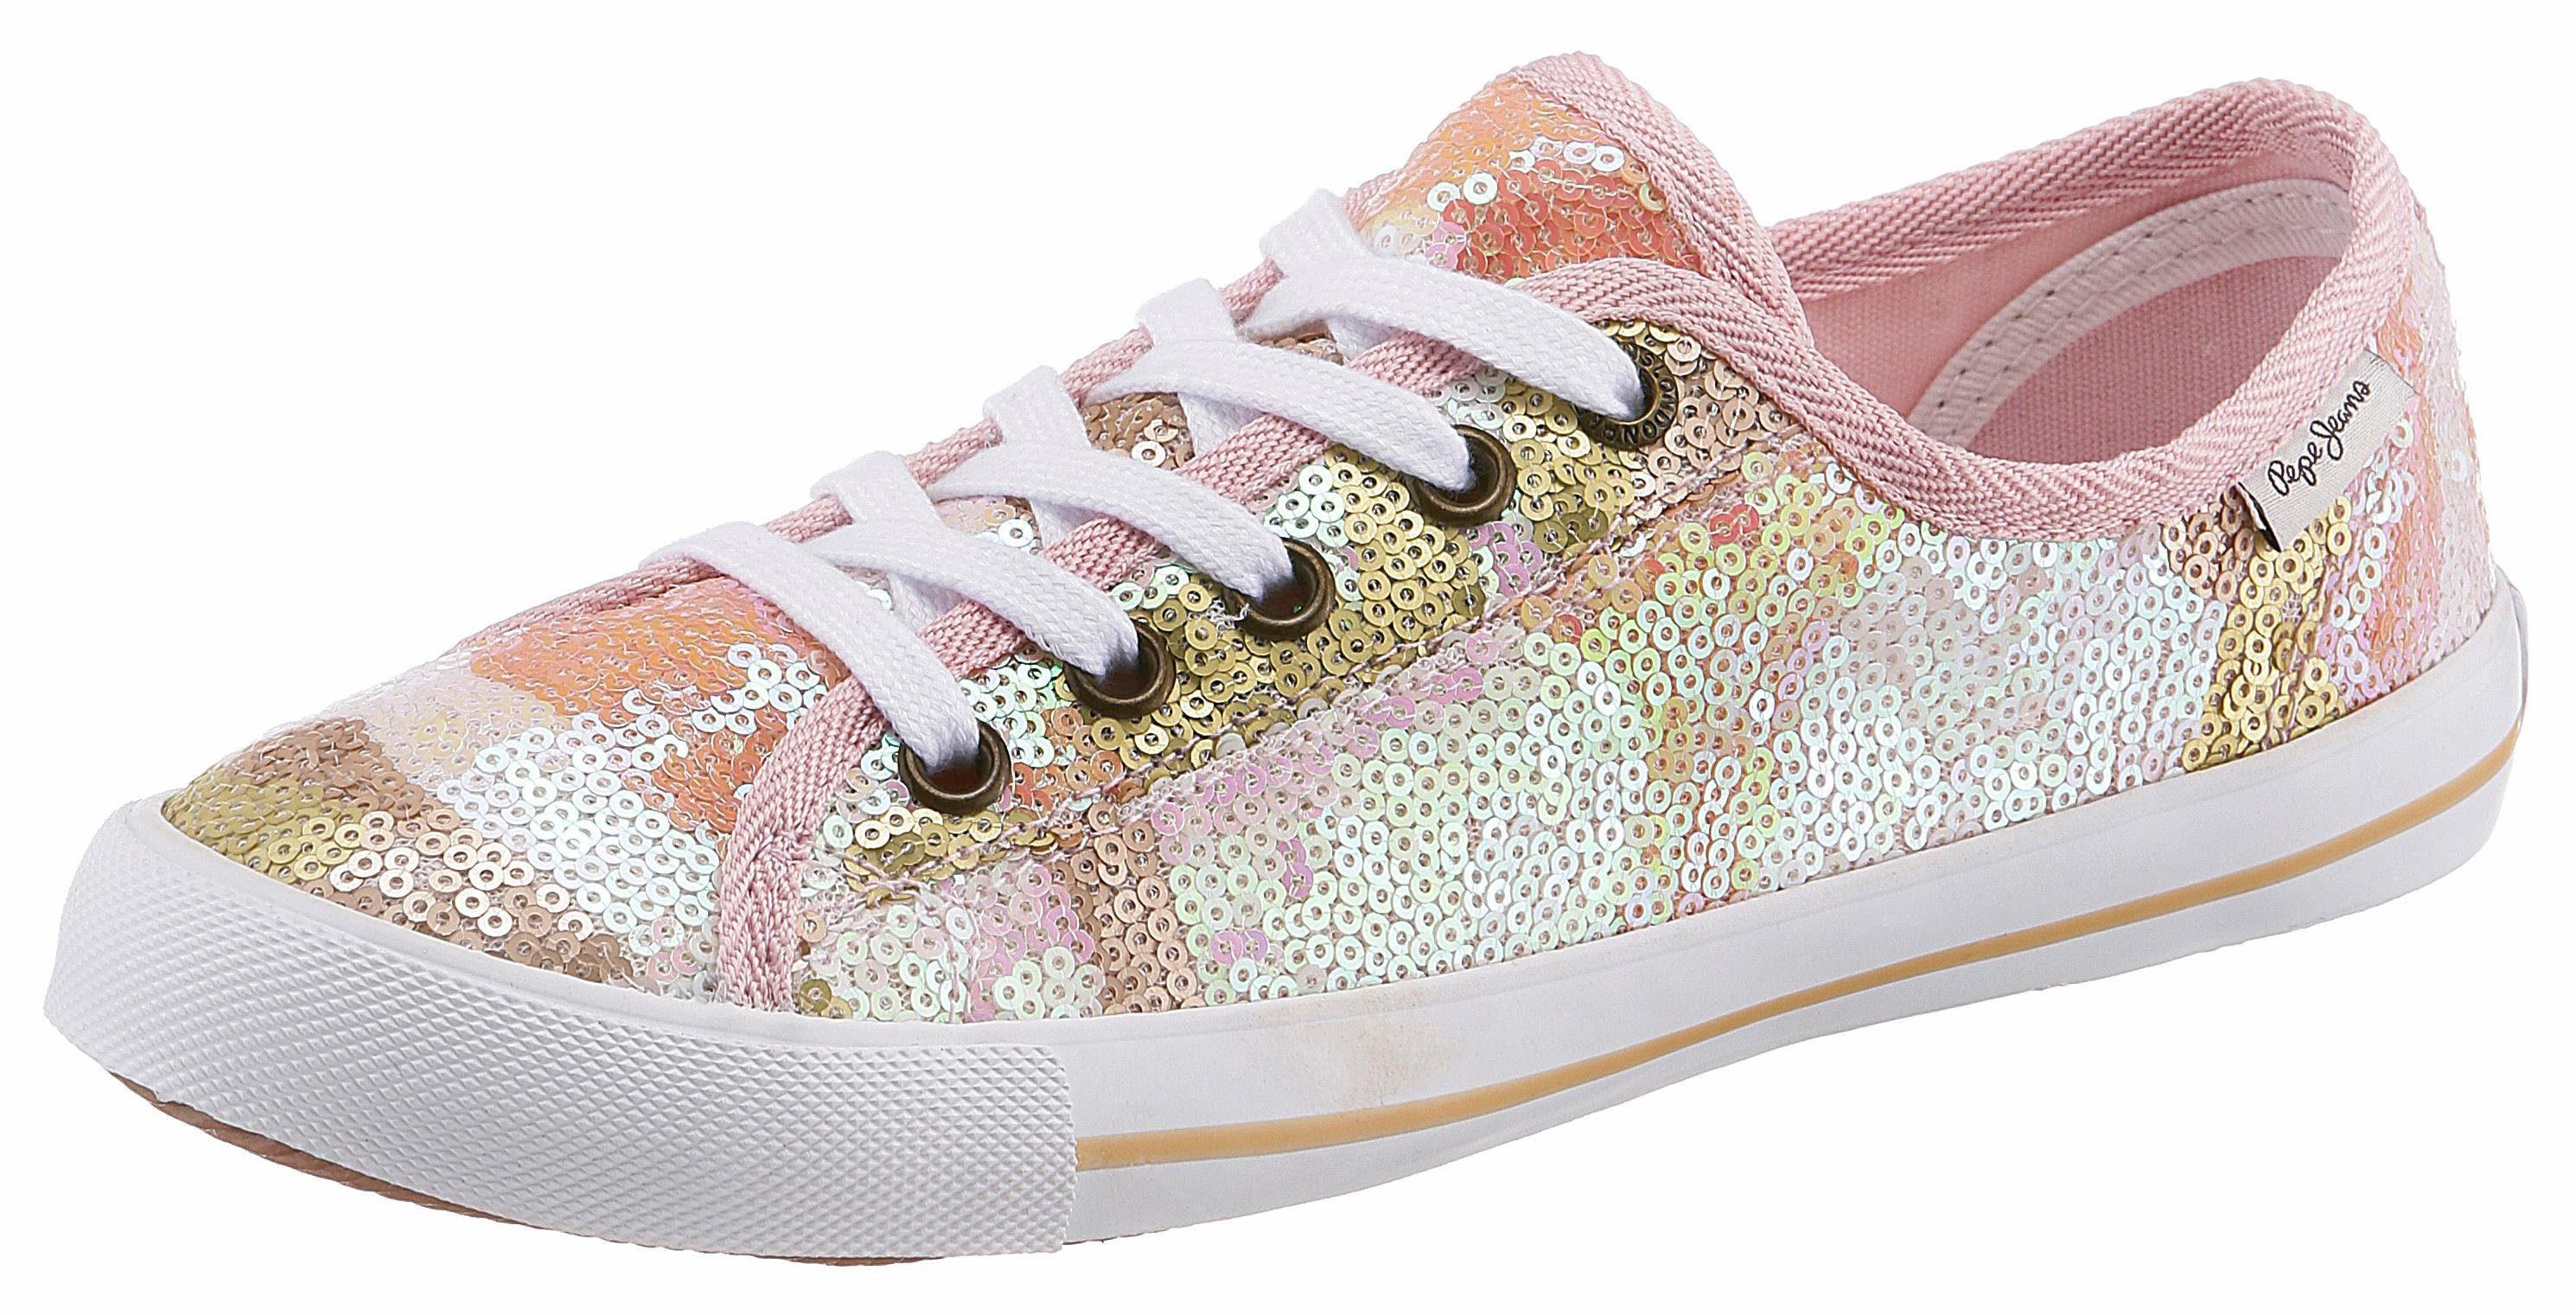 Pepe Jeans GERY JUNGLE Sneaker, mit Pailletten  goldfarben-rosé